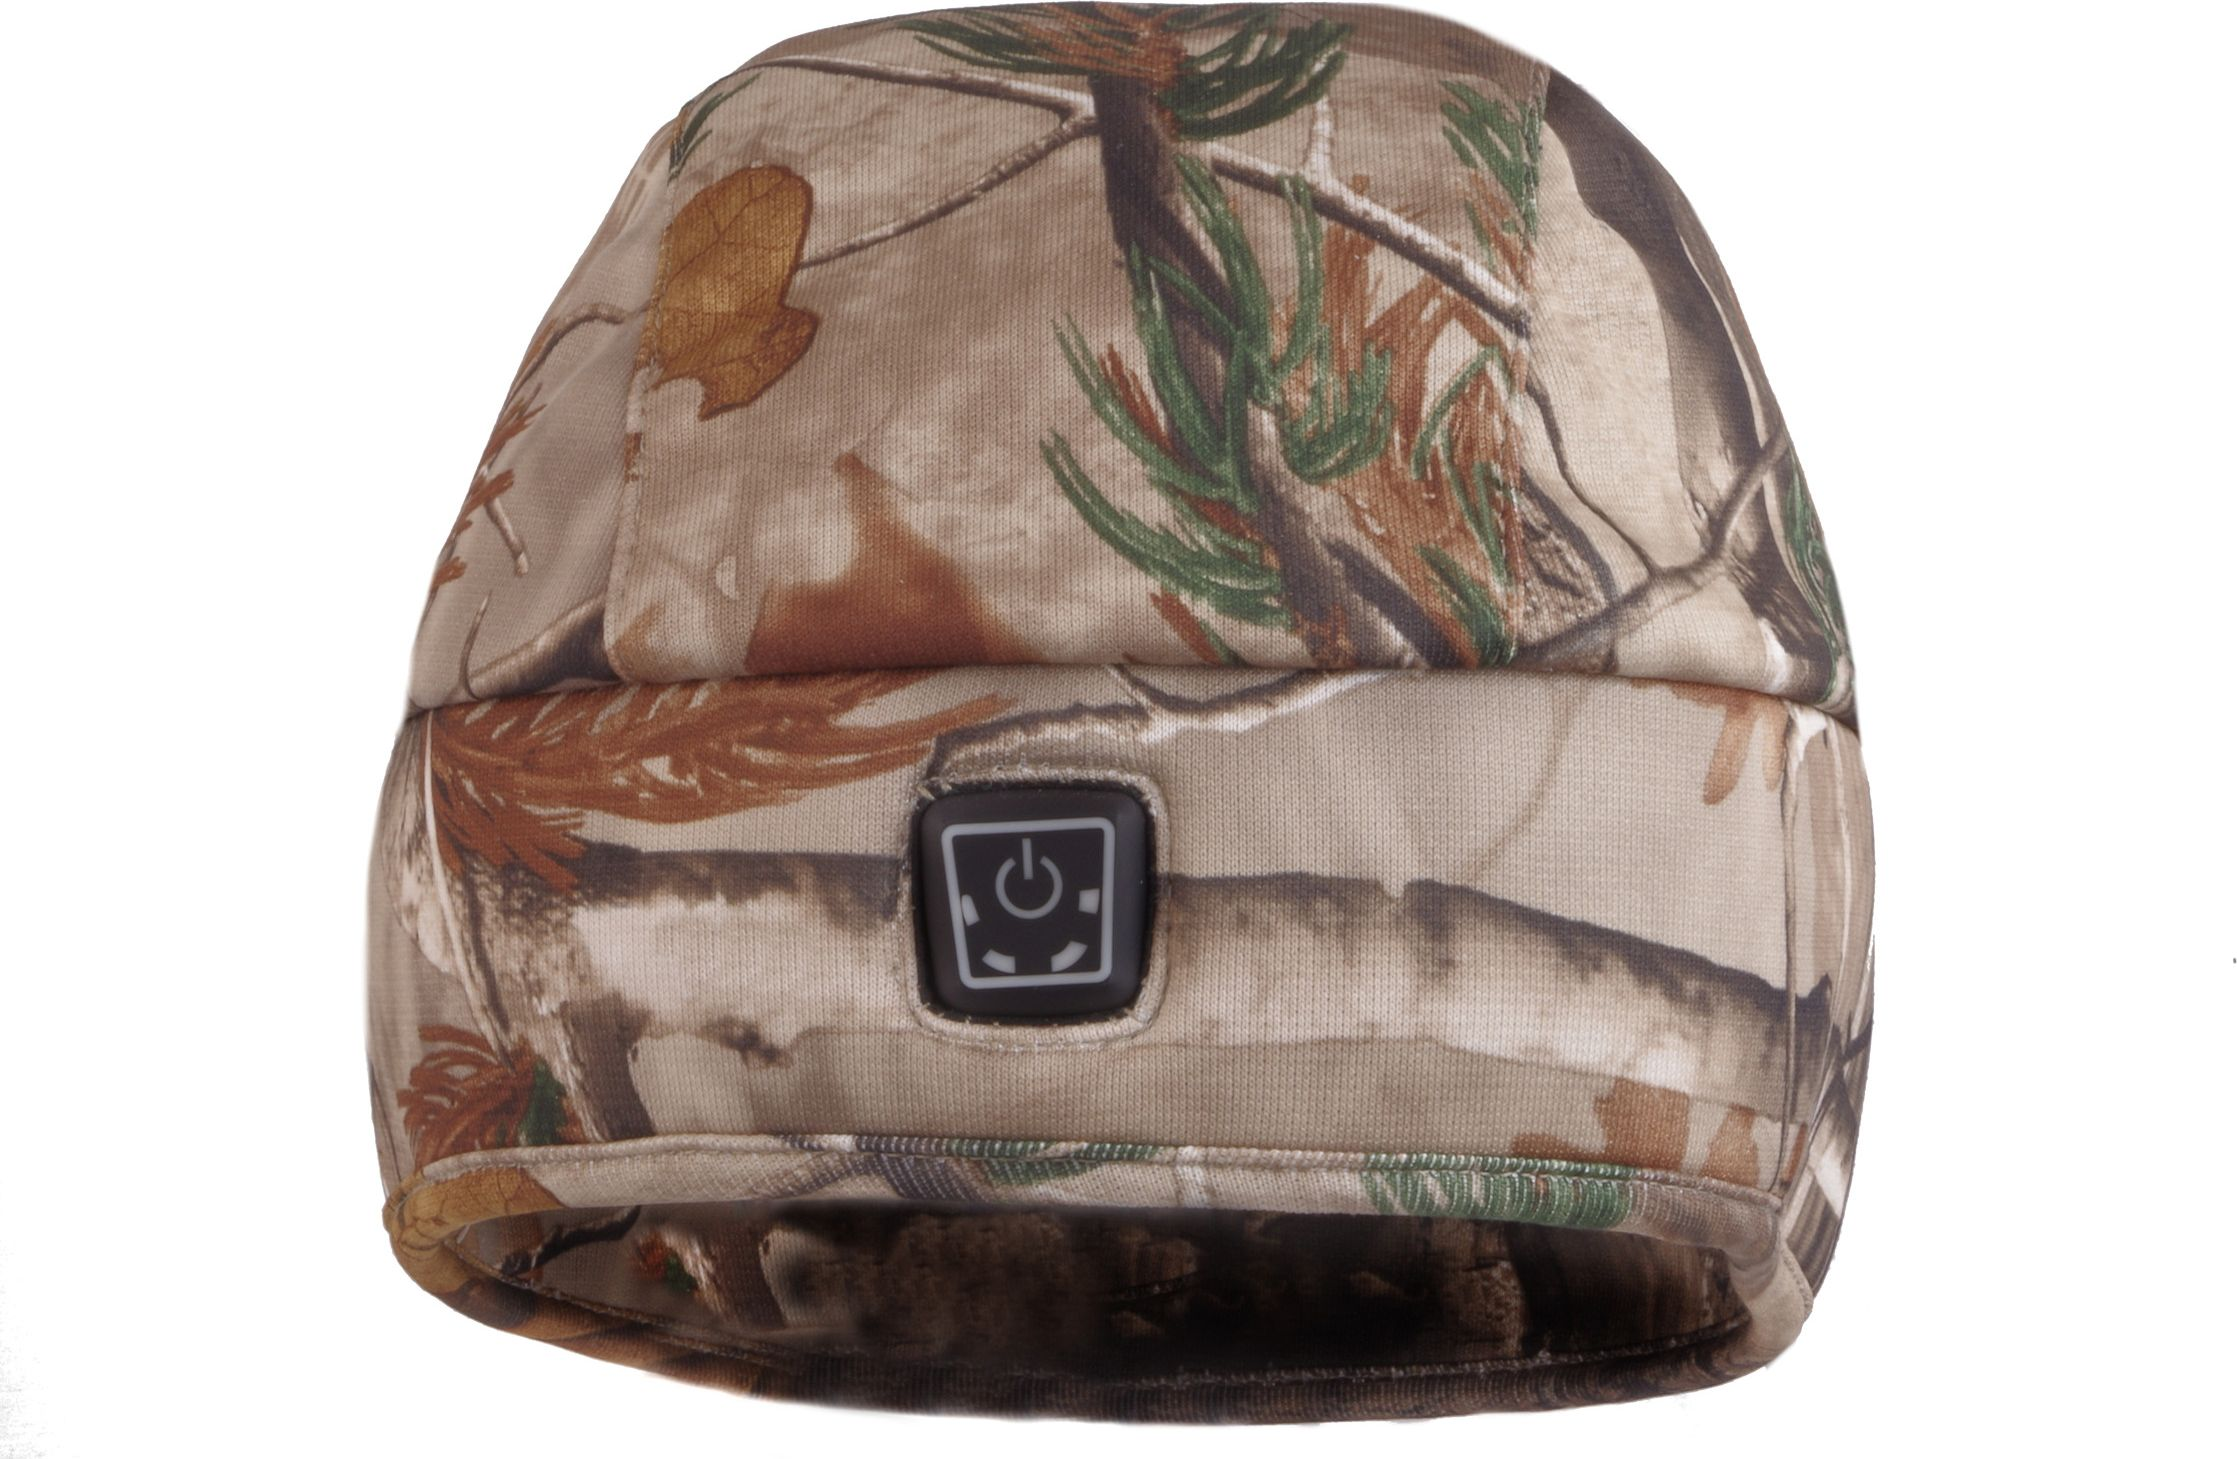 Glovii czapka ogrzewana kamuflaz Sporta aksesuāri